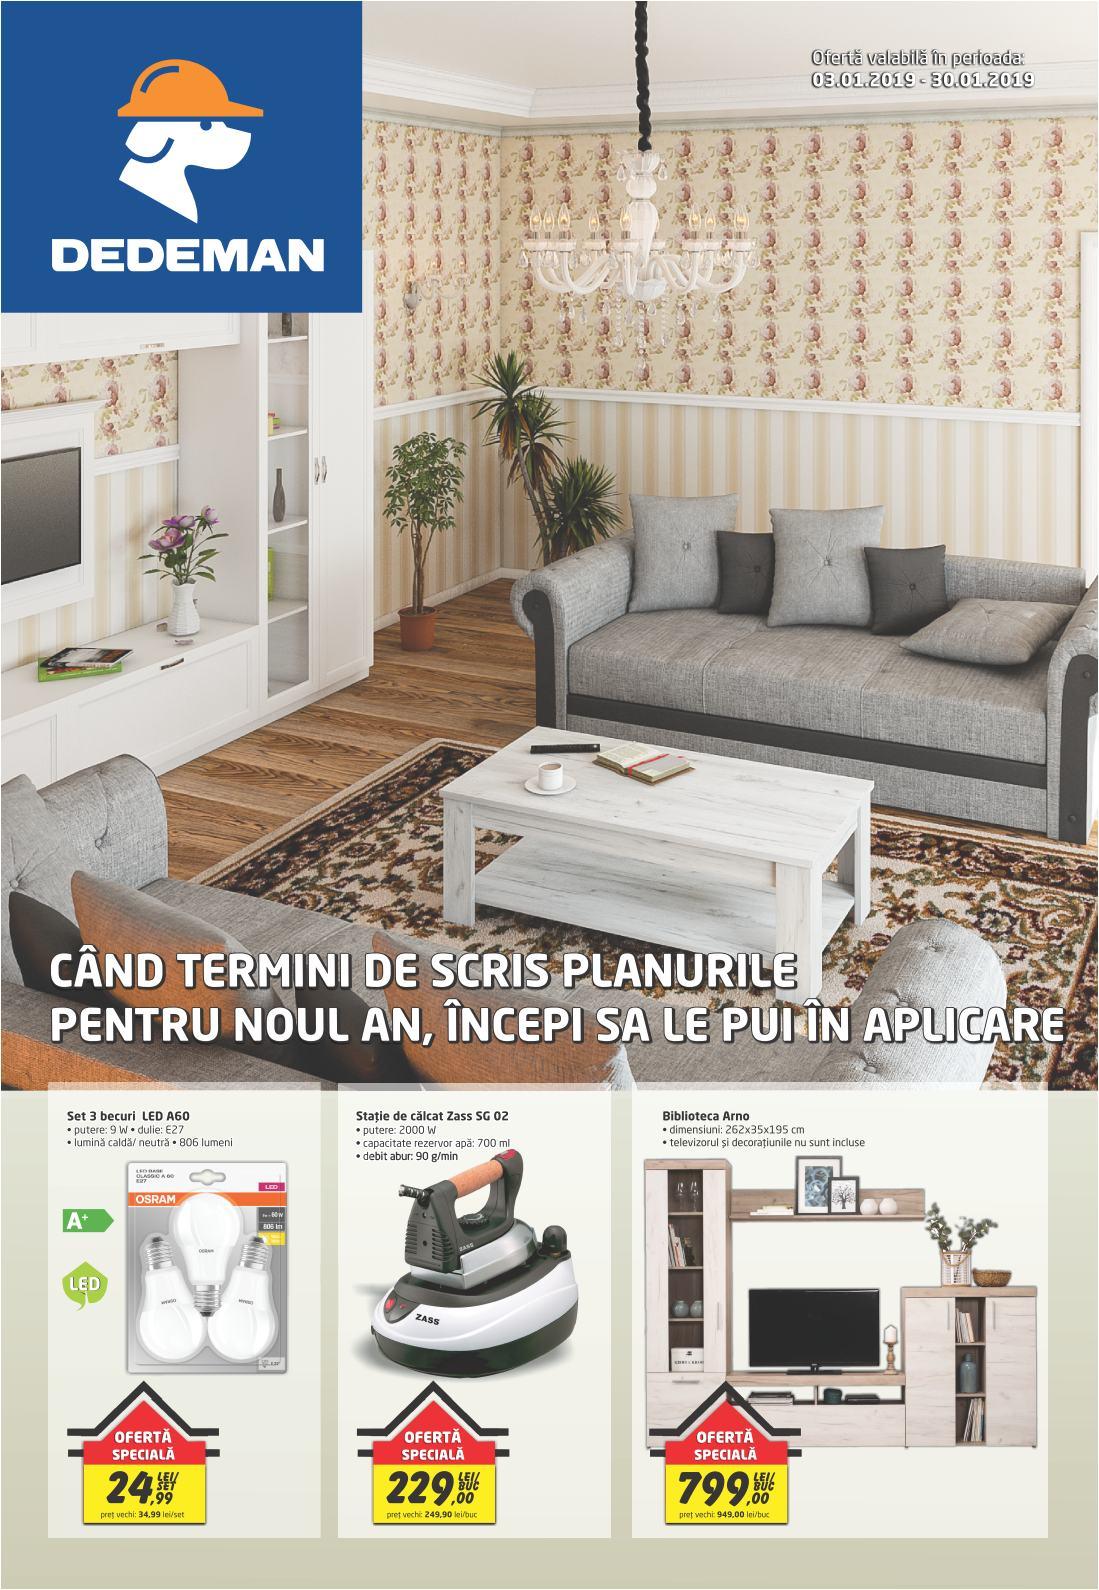 Catalog DEDEMAN - 03 Ianuarie 2019 - 30 Ianuarie 2019